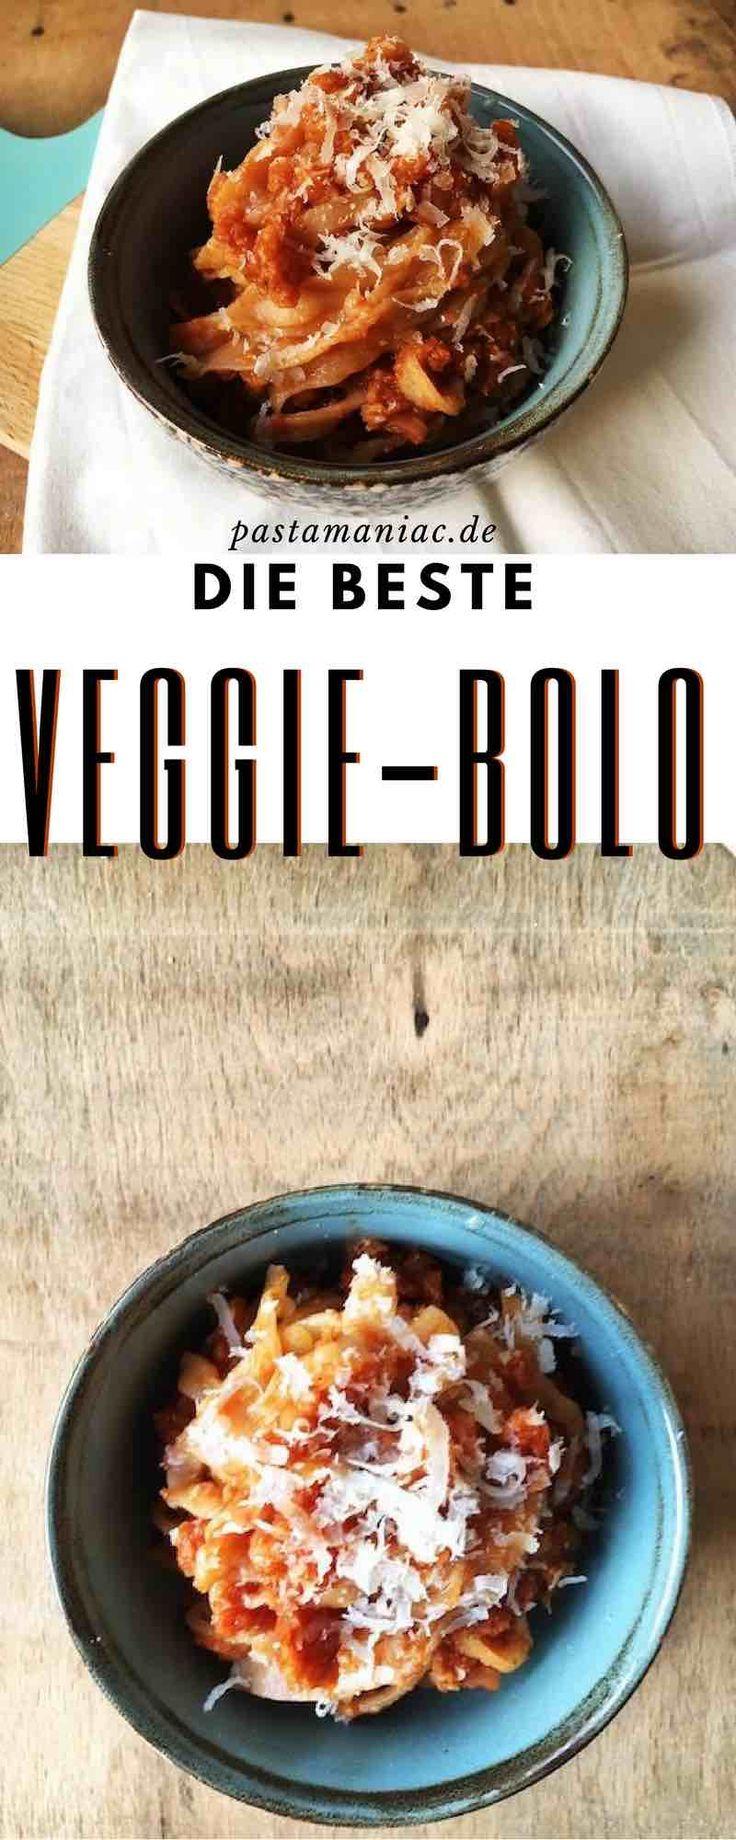 Die beste vegetarische Bolognese-Sauce der Welt! Versprochen.   #pasta #nudeln #bolognese #rezept